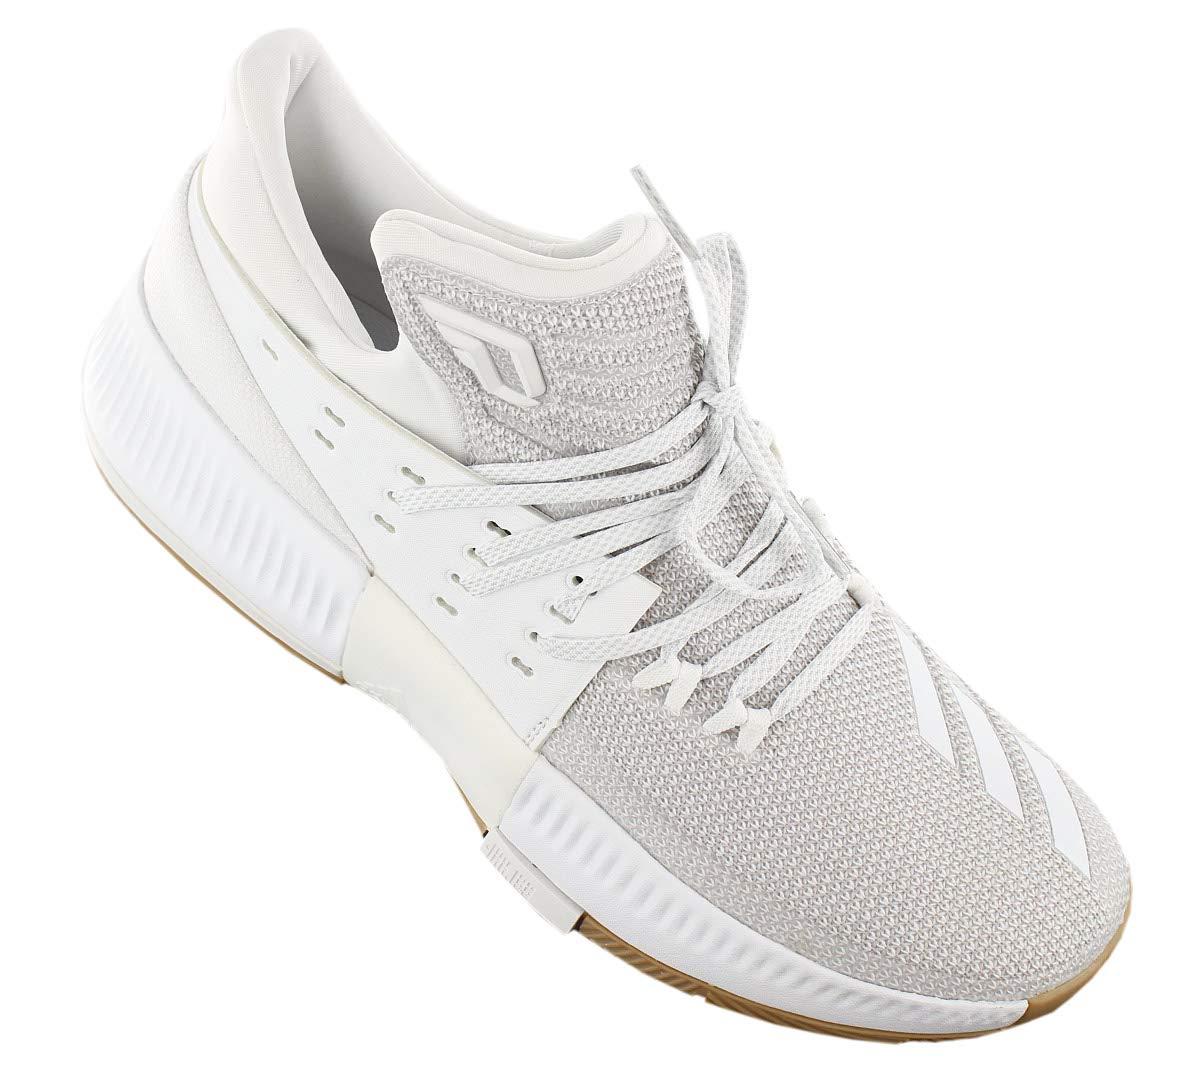 Adidas Crazy Time - ftwwht ftwwht ftwwht ftwwht gum4 B06XQTXD85 Basketballschuhe Abholung in der Boutique cf4c6c